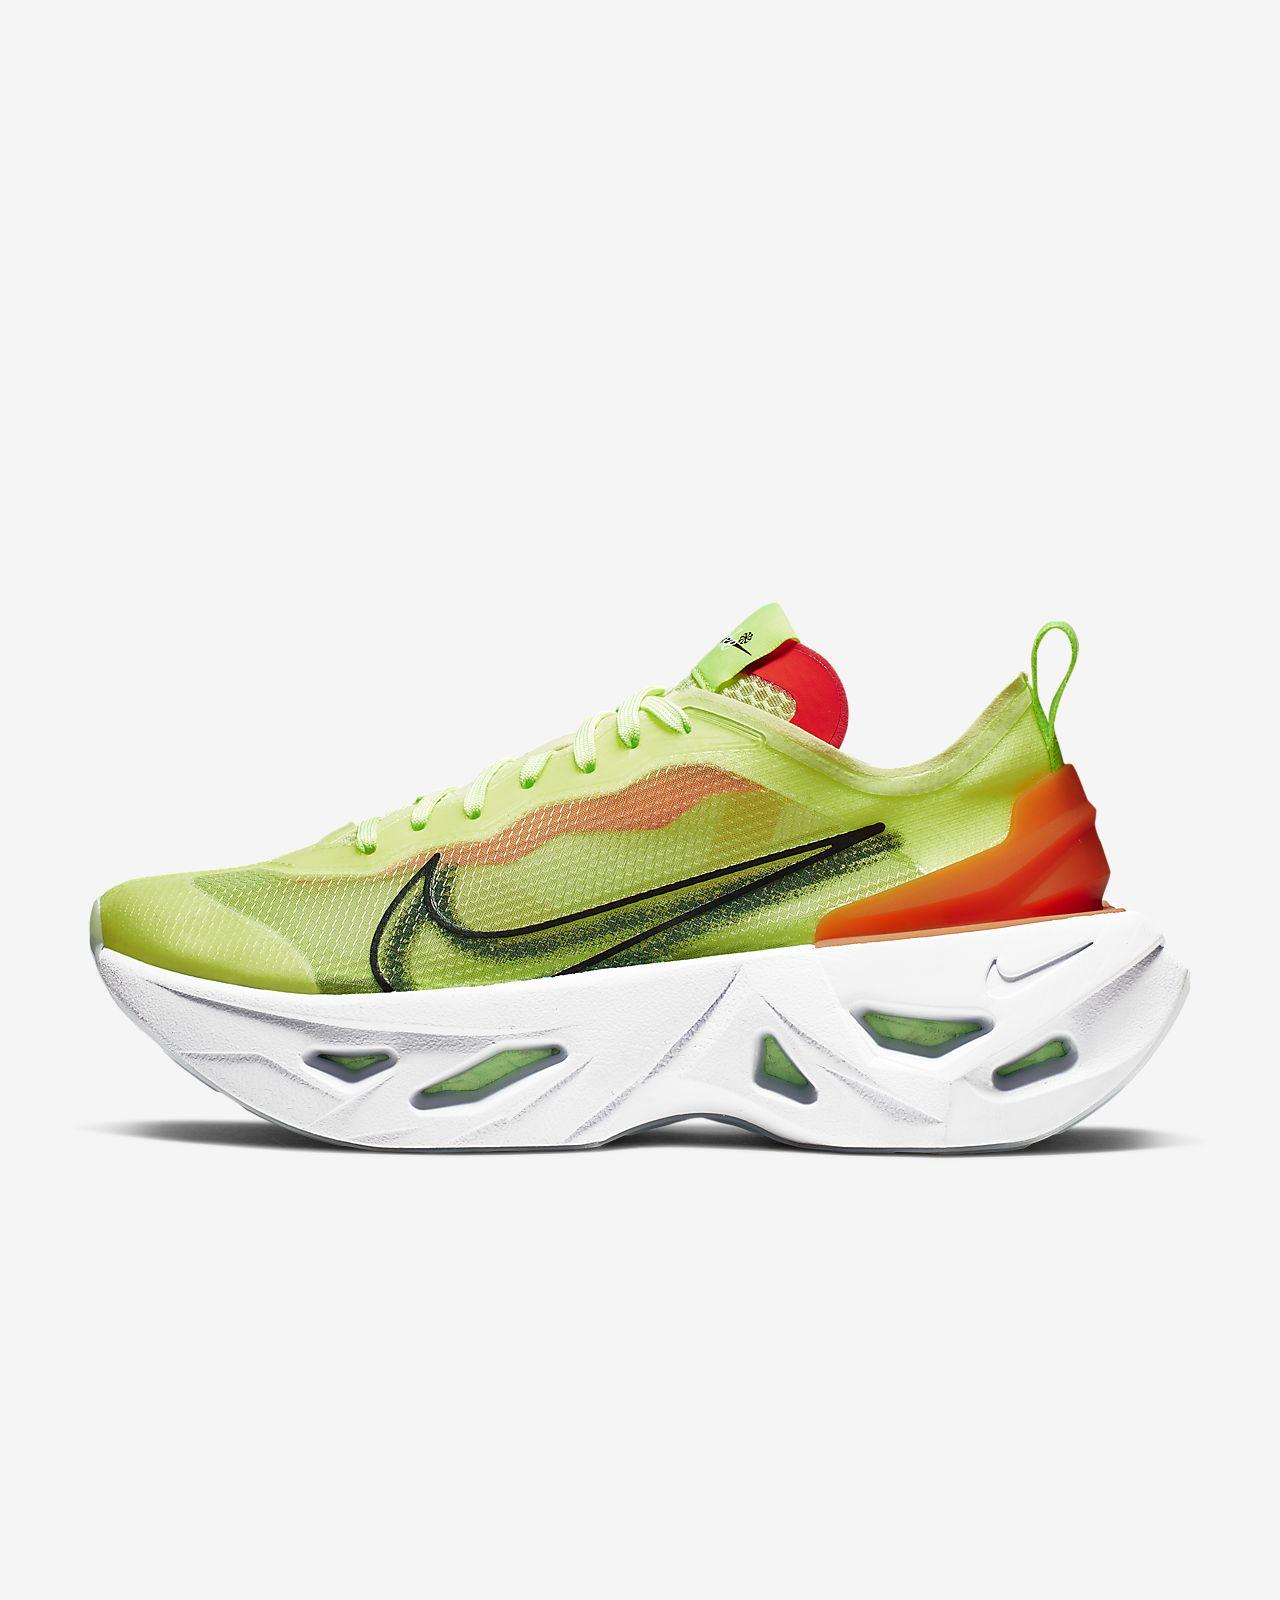 giay chunky sneaker Nike zoomx vista grind - elle man